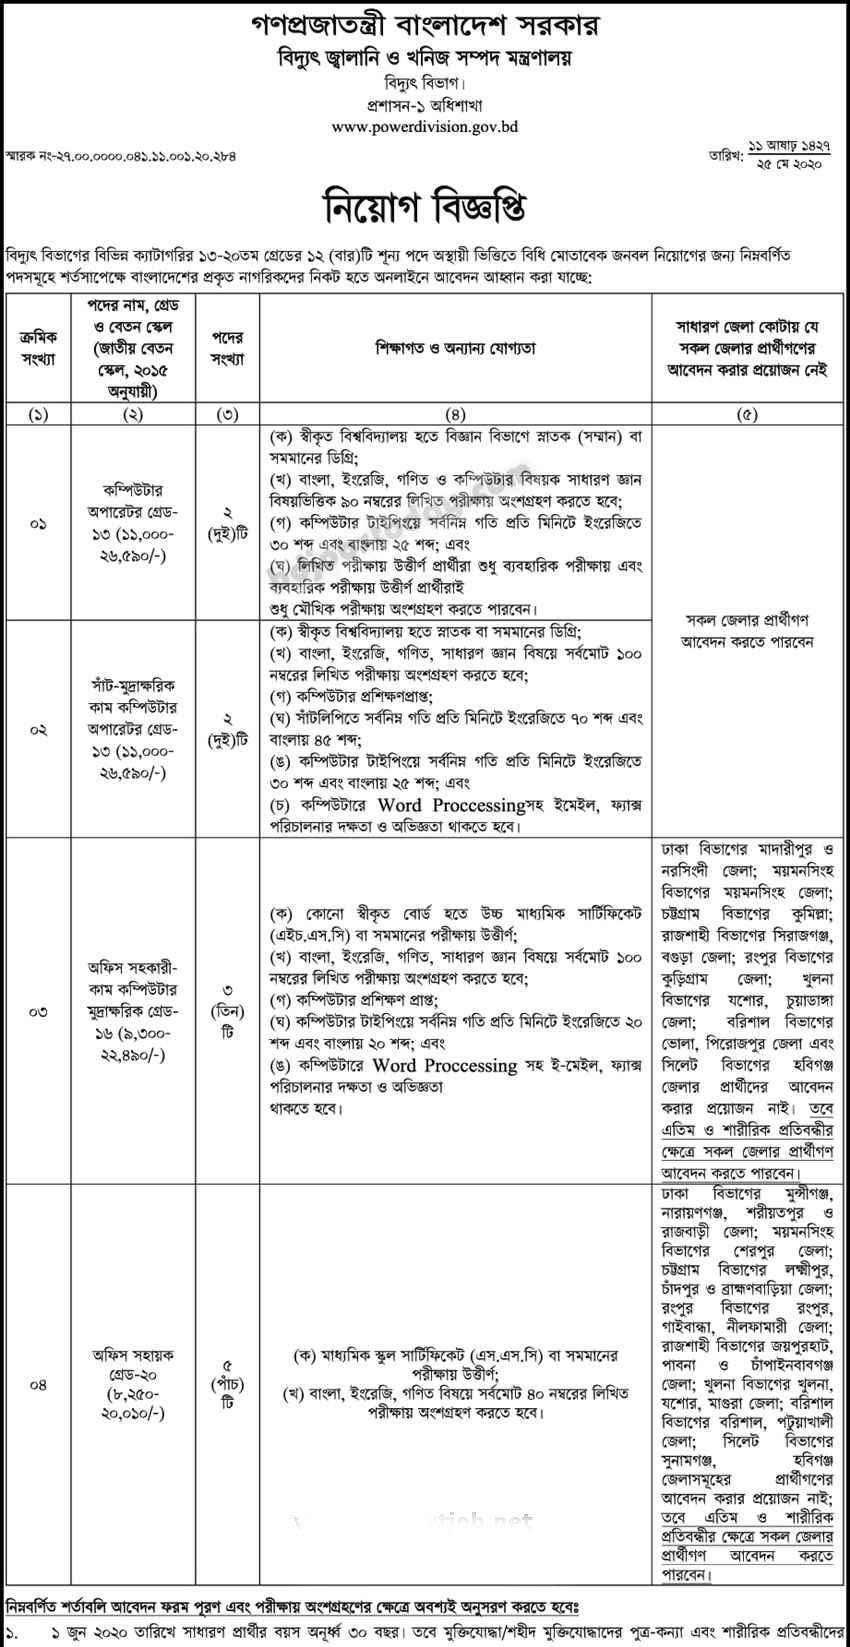 Power Division Job Circular 2020 | Govt Job Circular | Apply on pd.teletalk.com.bd 2